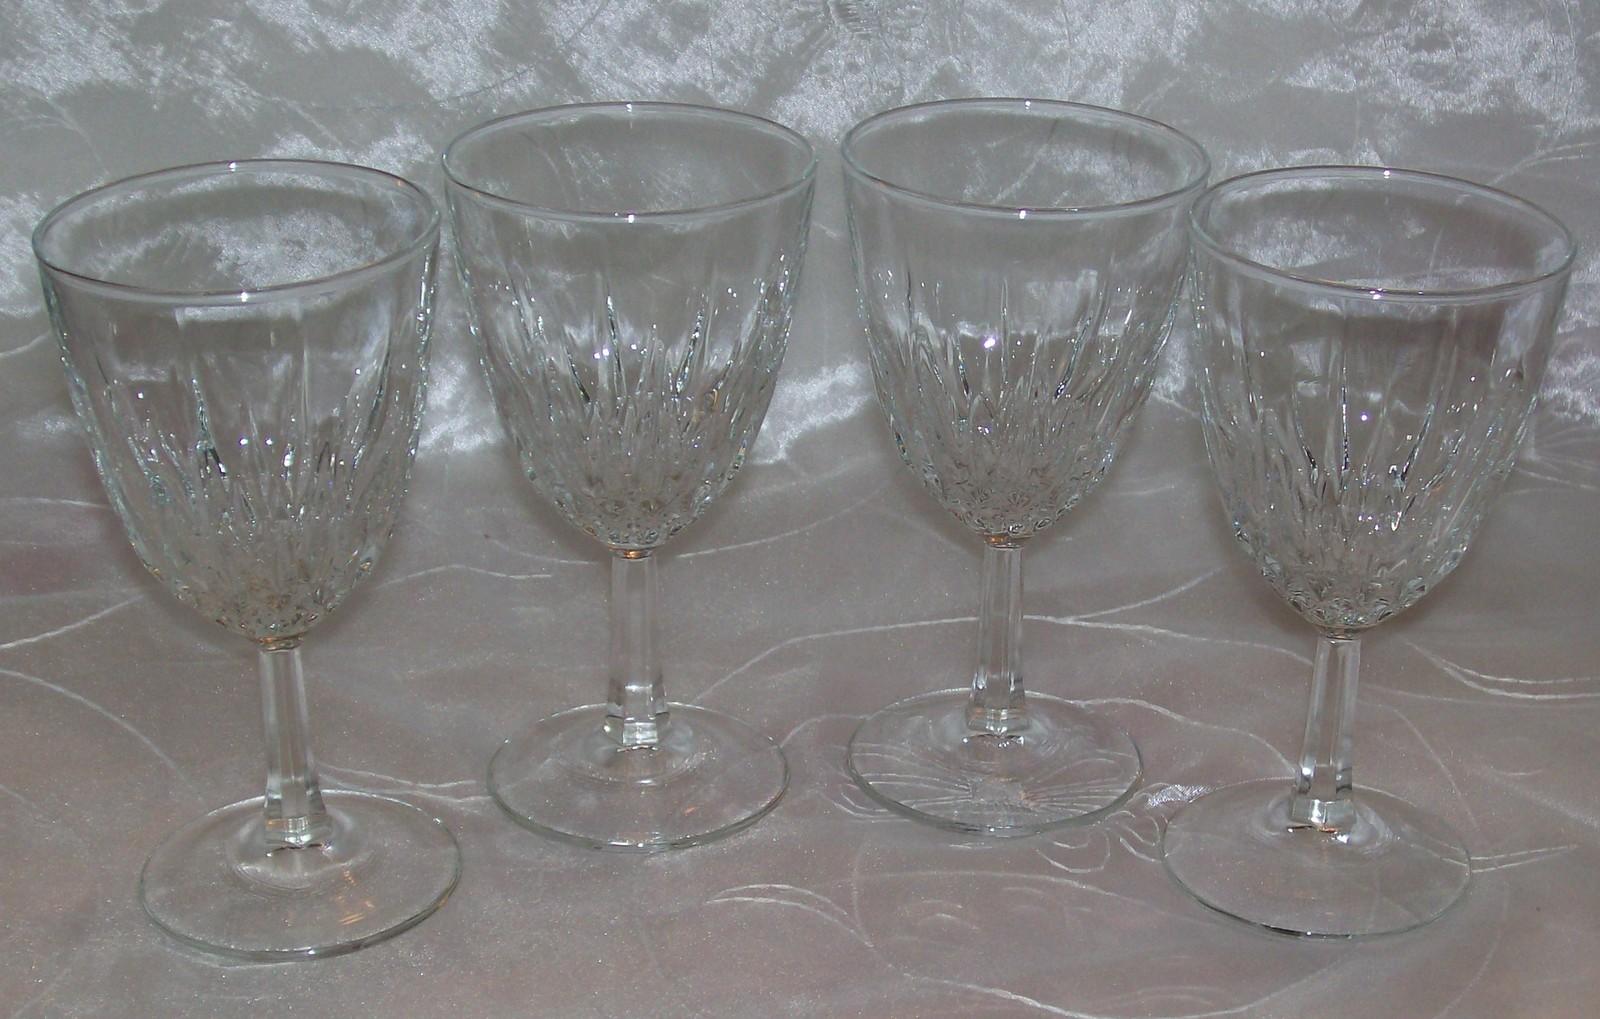 cristal d 39 arques stemware crystal diamant wine glasses set 4 5 tall france j g durand. Black Bedroom Furniture Sets. Home Design Ideas